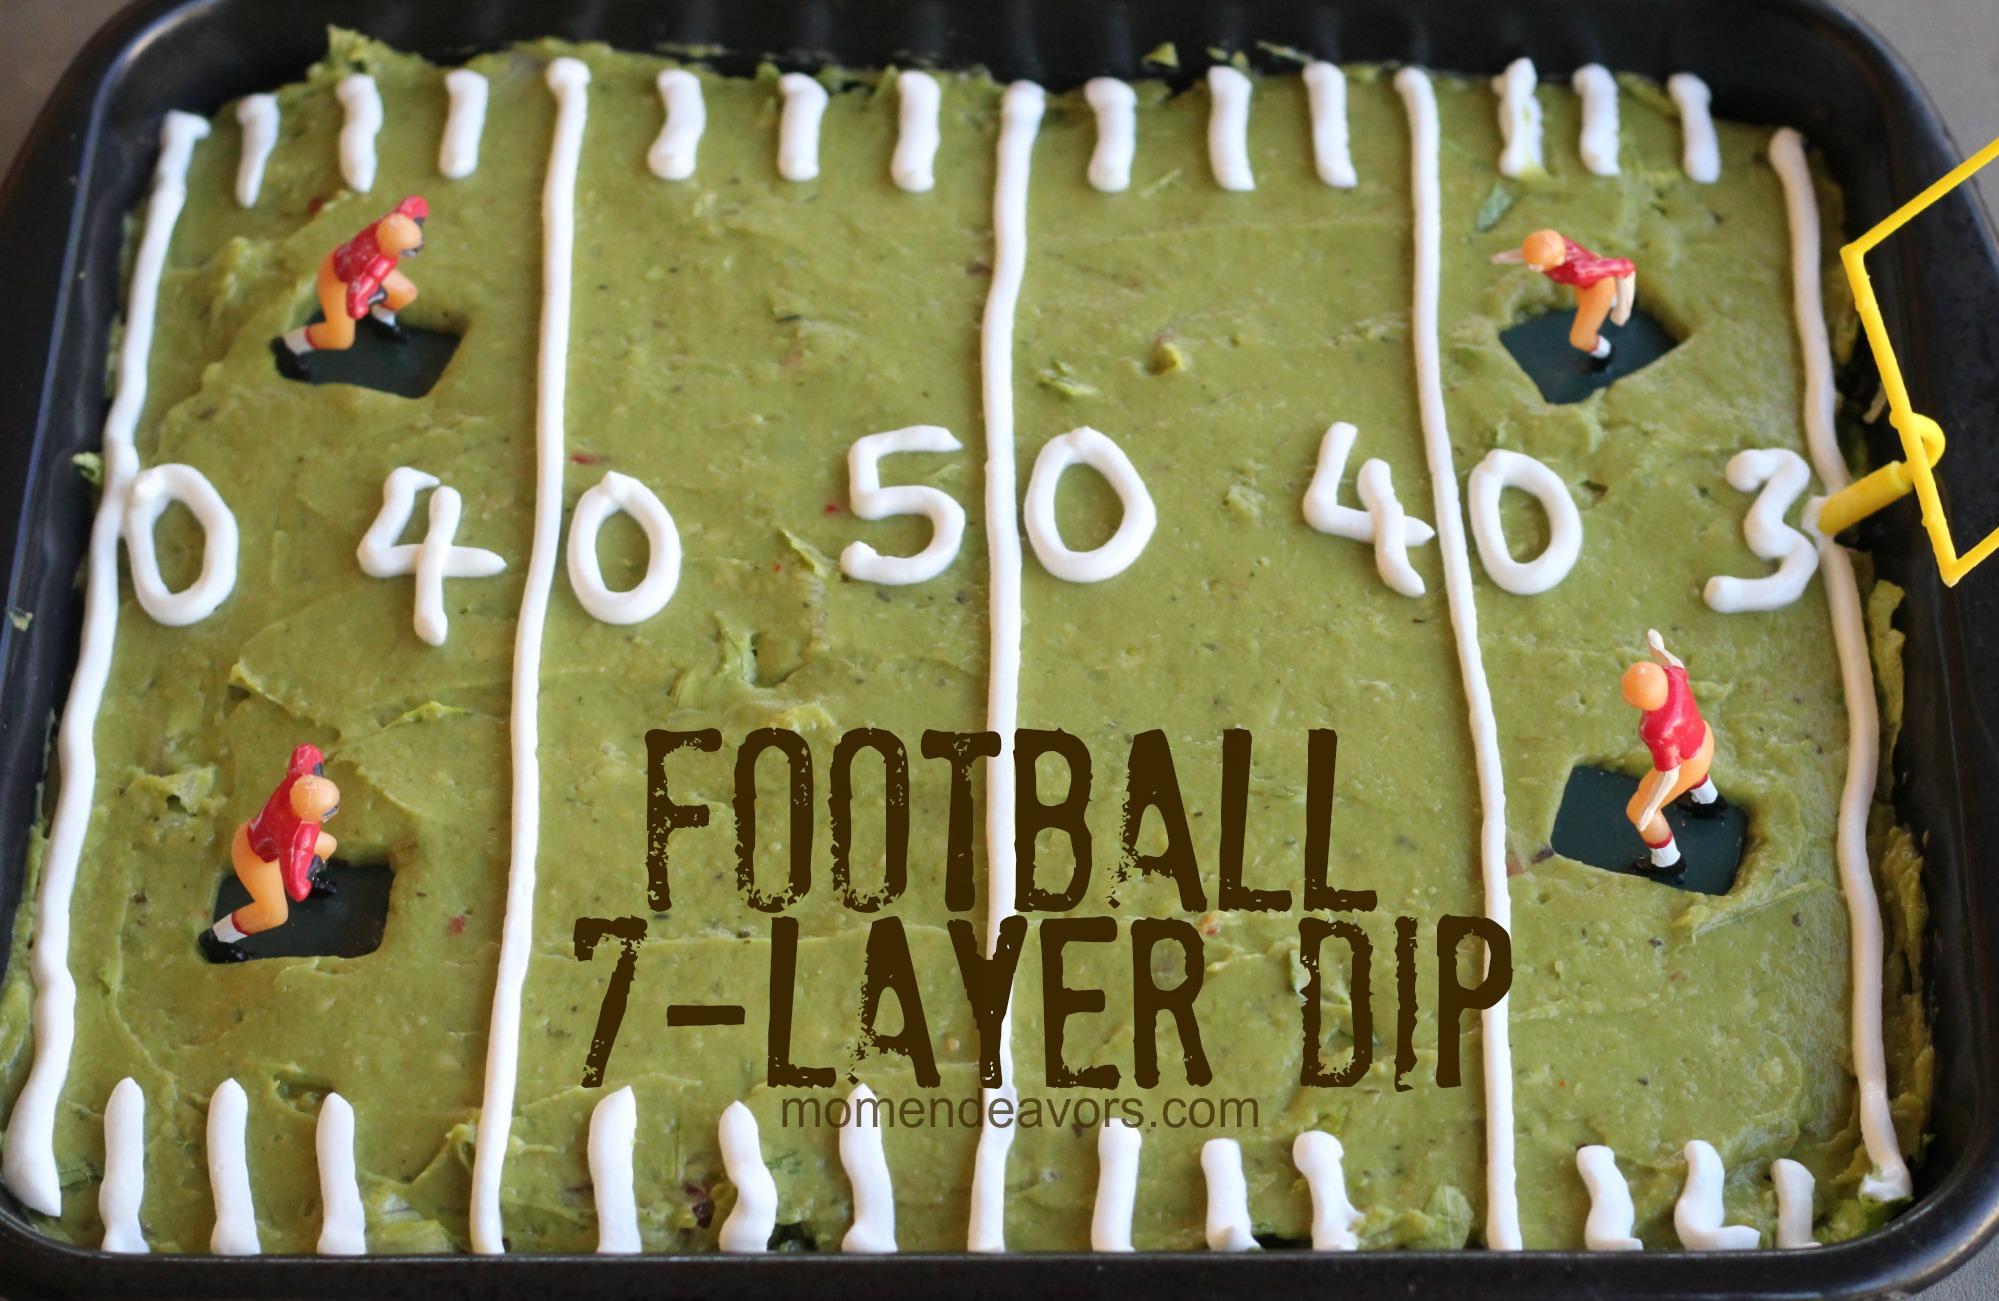 Football 7-Layer Dip